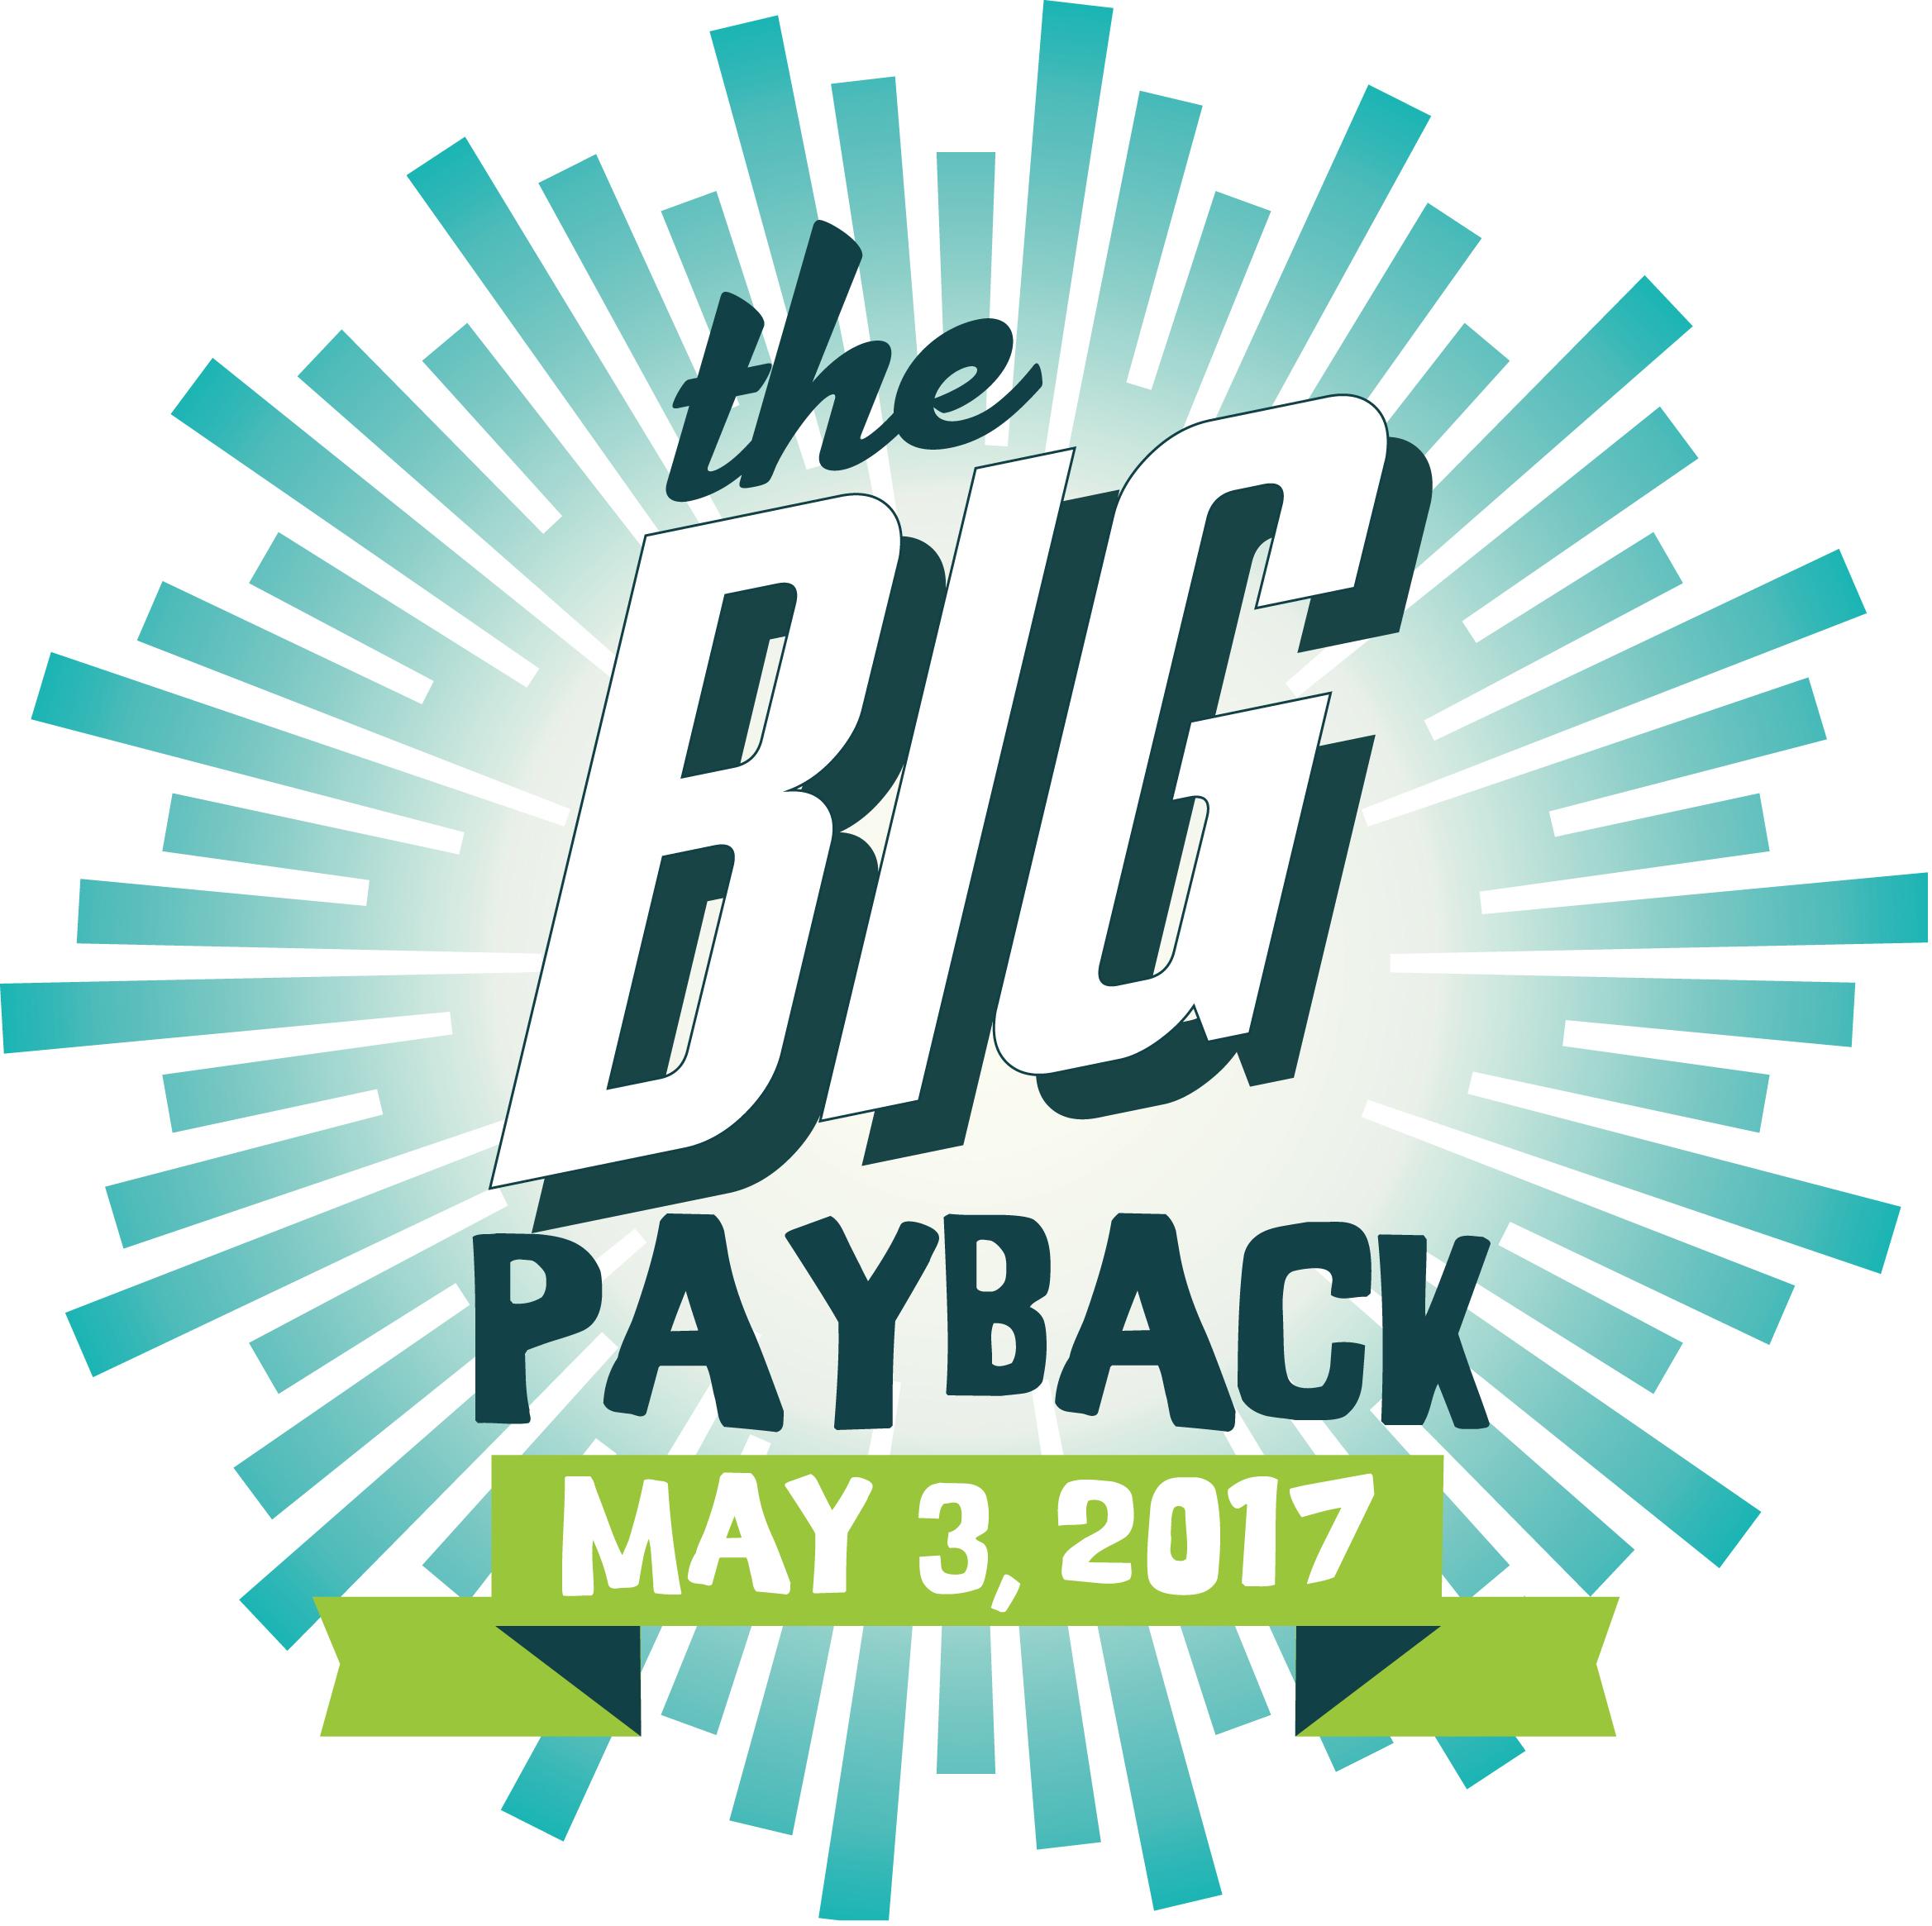 Big_Payback-2017.jpg